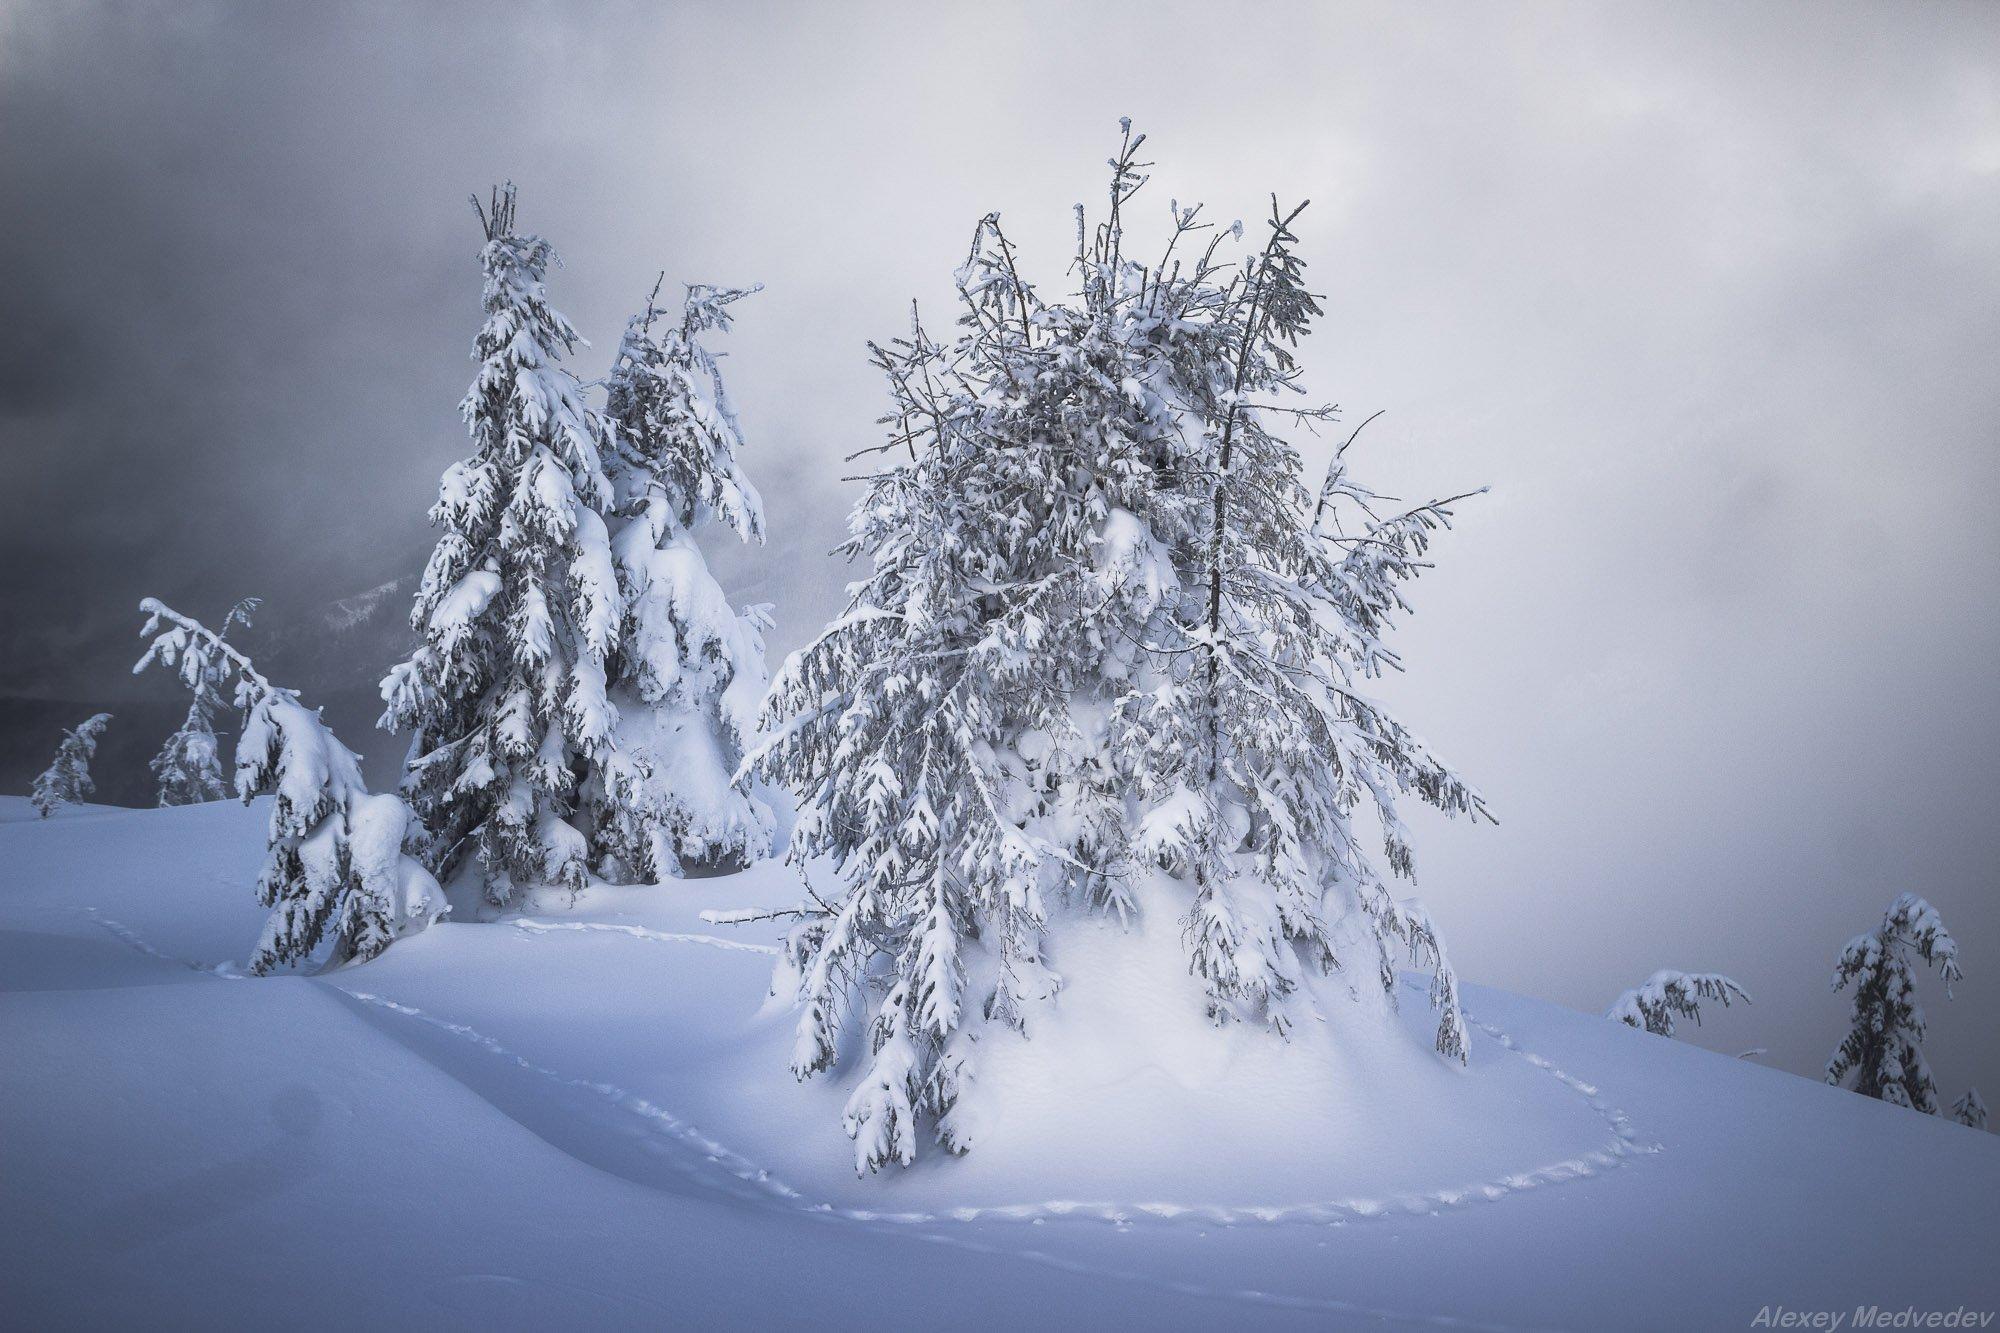 cold, wint, snow, steps, montain, trees, carpathains. , Алексей Медведев